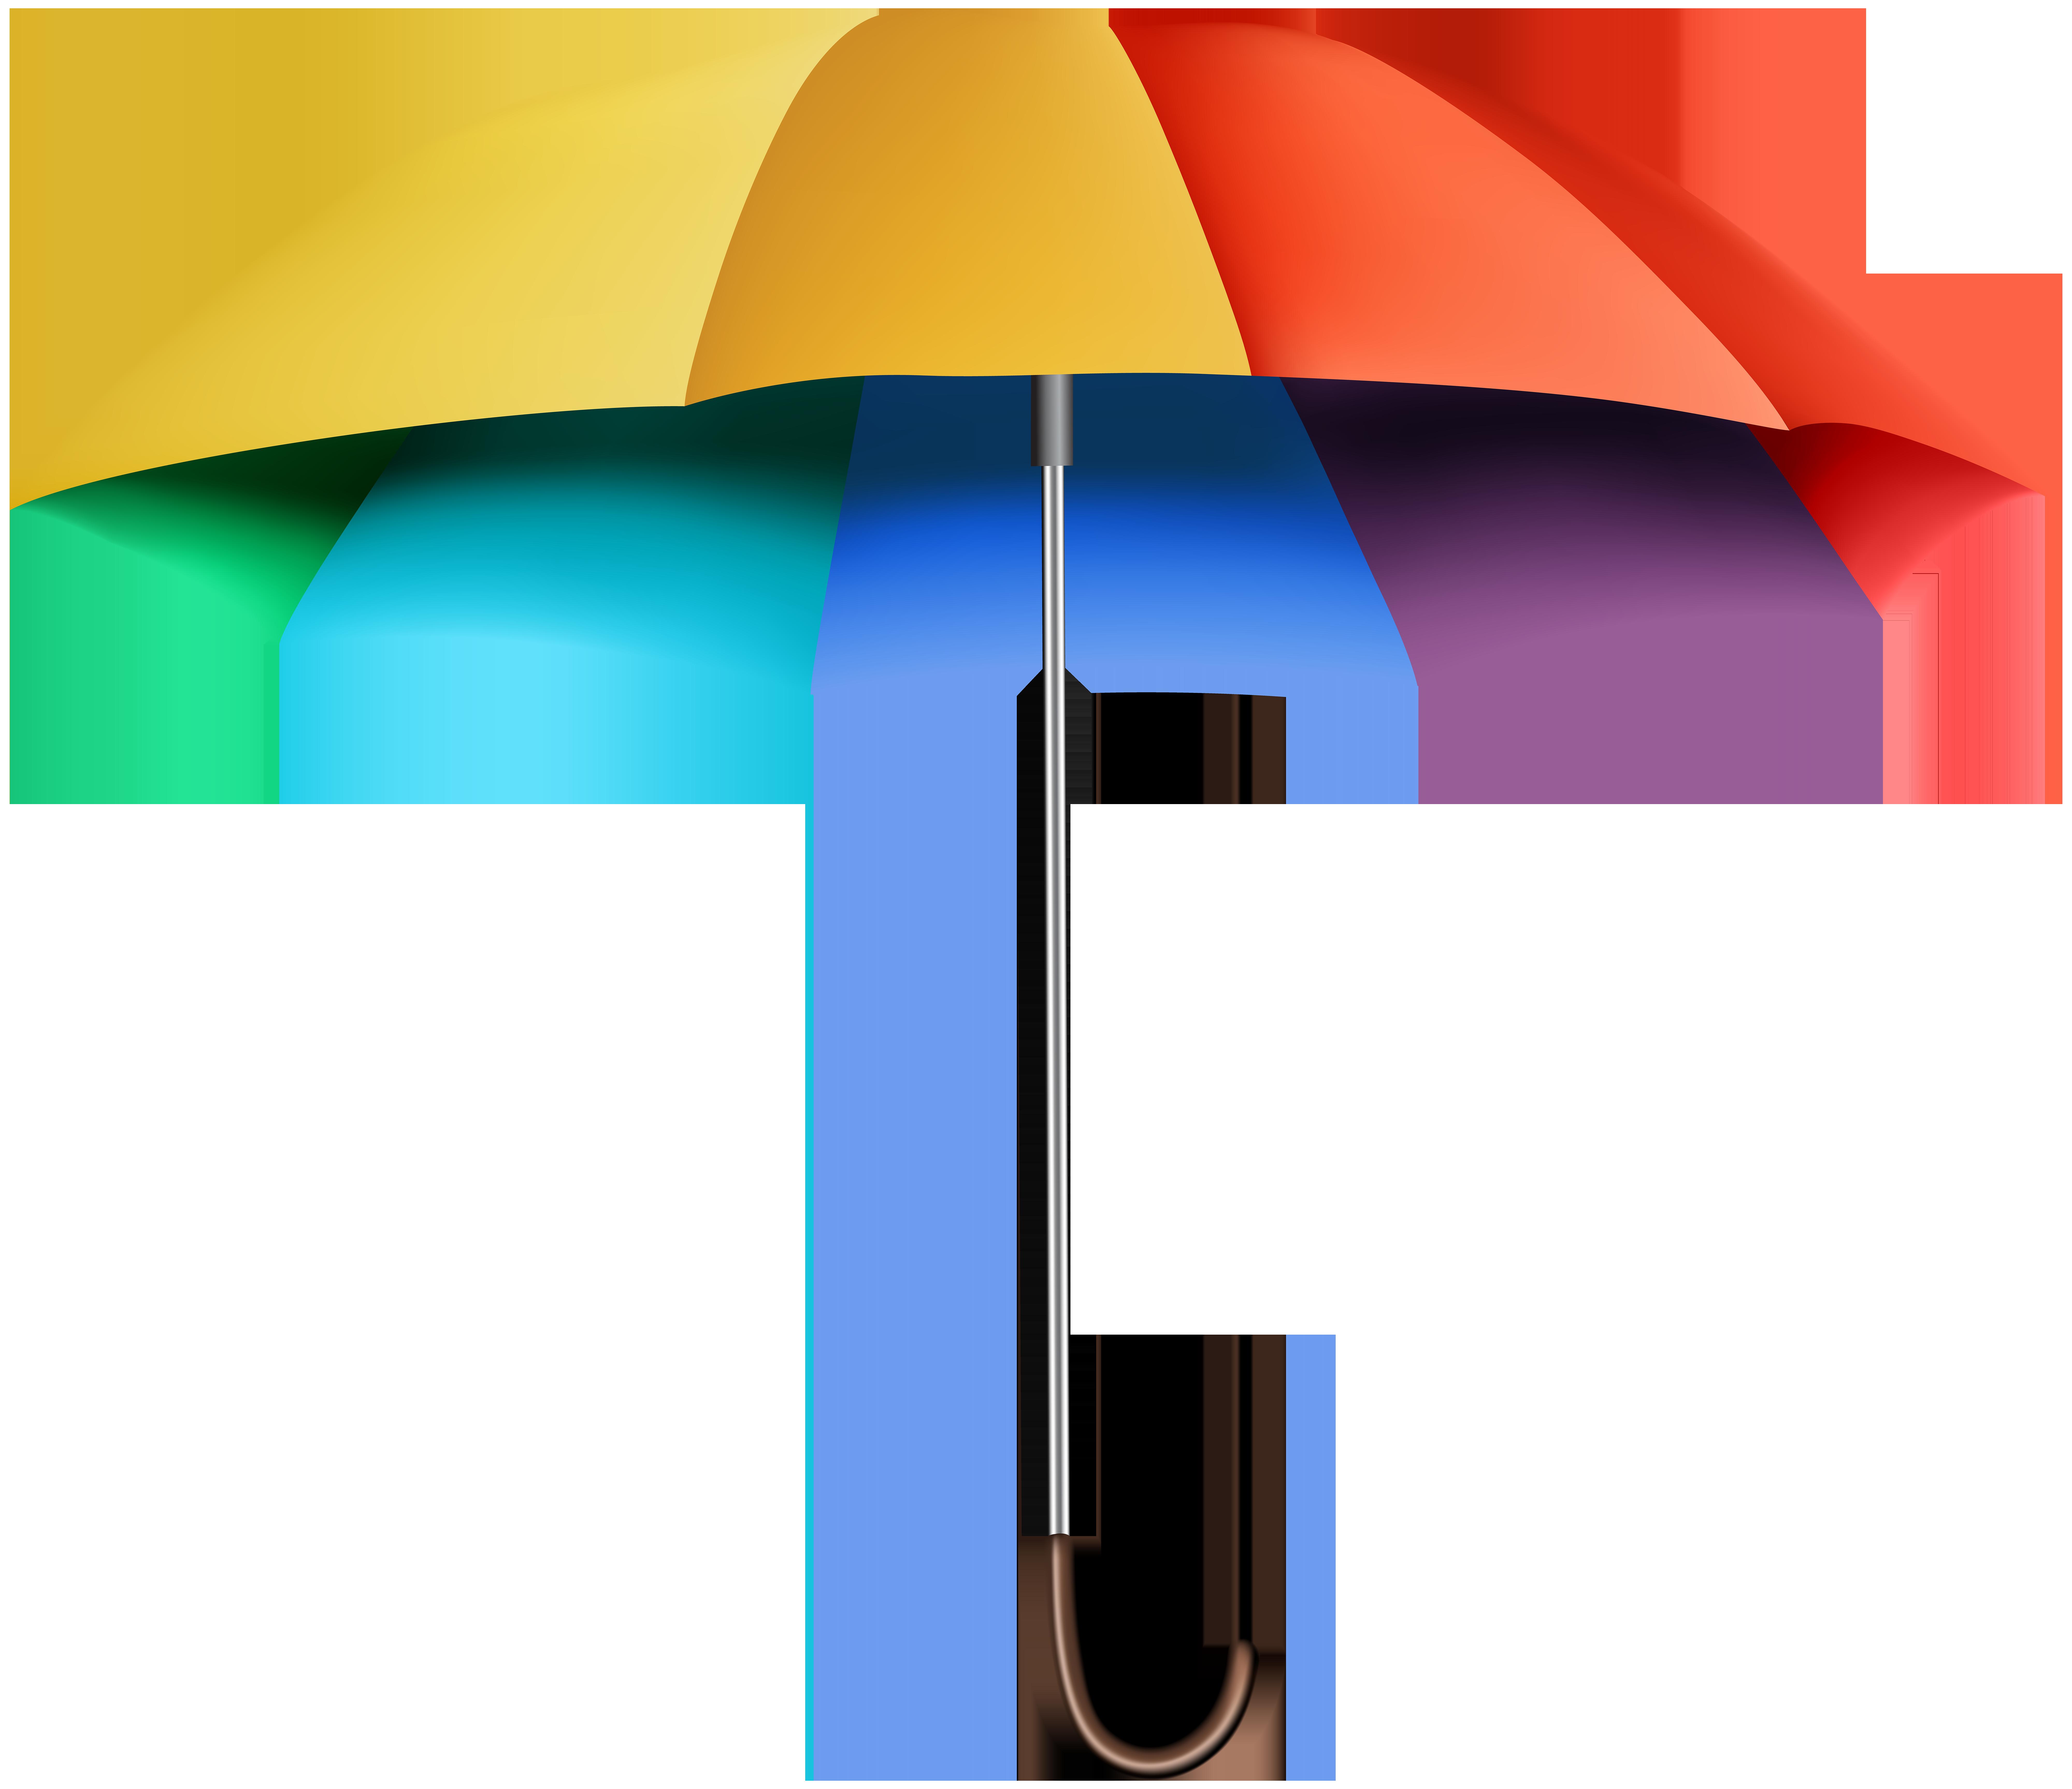 Rainbow pumpkin clipart image free Rainbow Umbrella Transparent Clip Art Image | Gallery Yopriceville ... image free